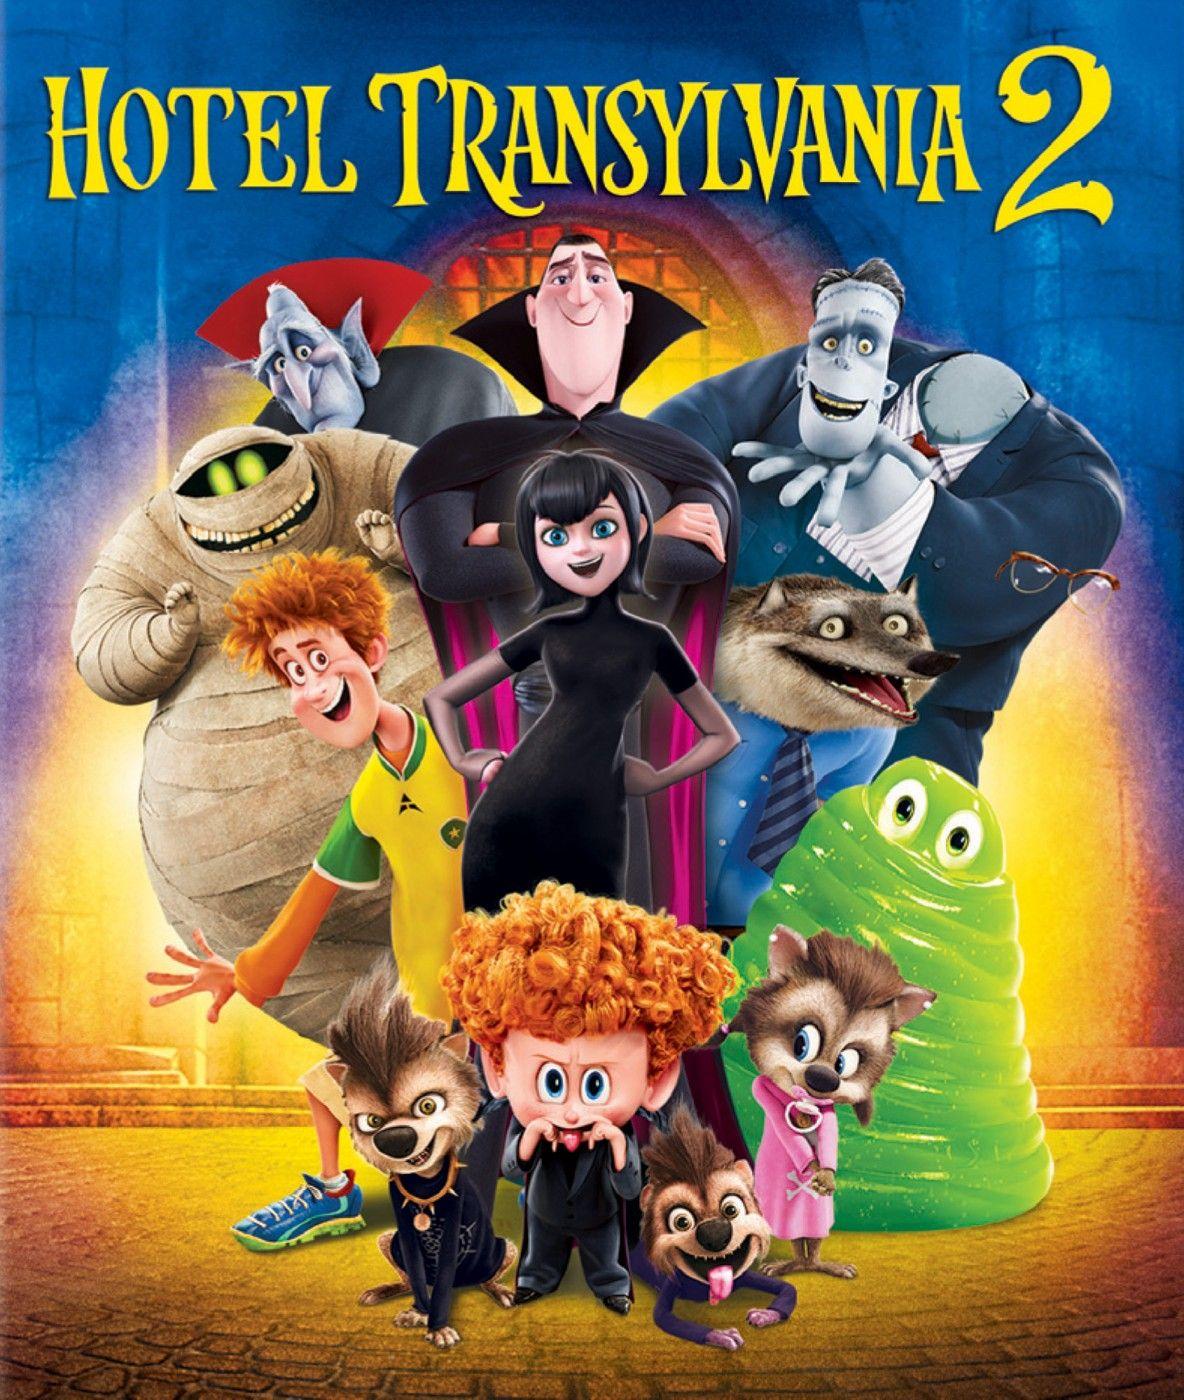 Hotel Transylvania 2 2015 Now That Dracula Adam Sandler Has Opened The Hotel Transyl Hotel Transylvania 2 Hotel Transylvania Hotel Transylvania 2 Movie